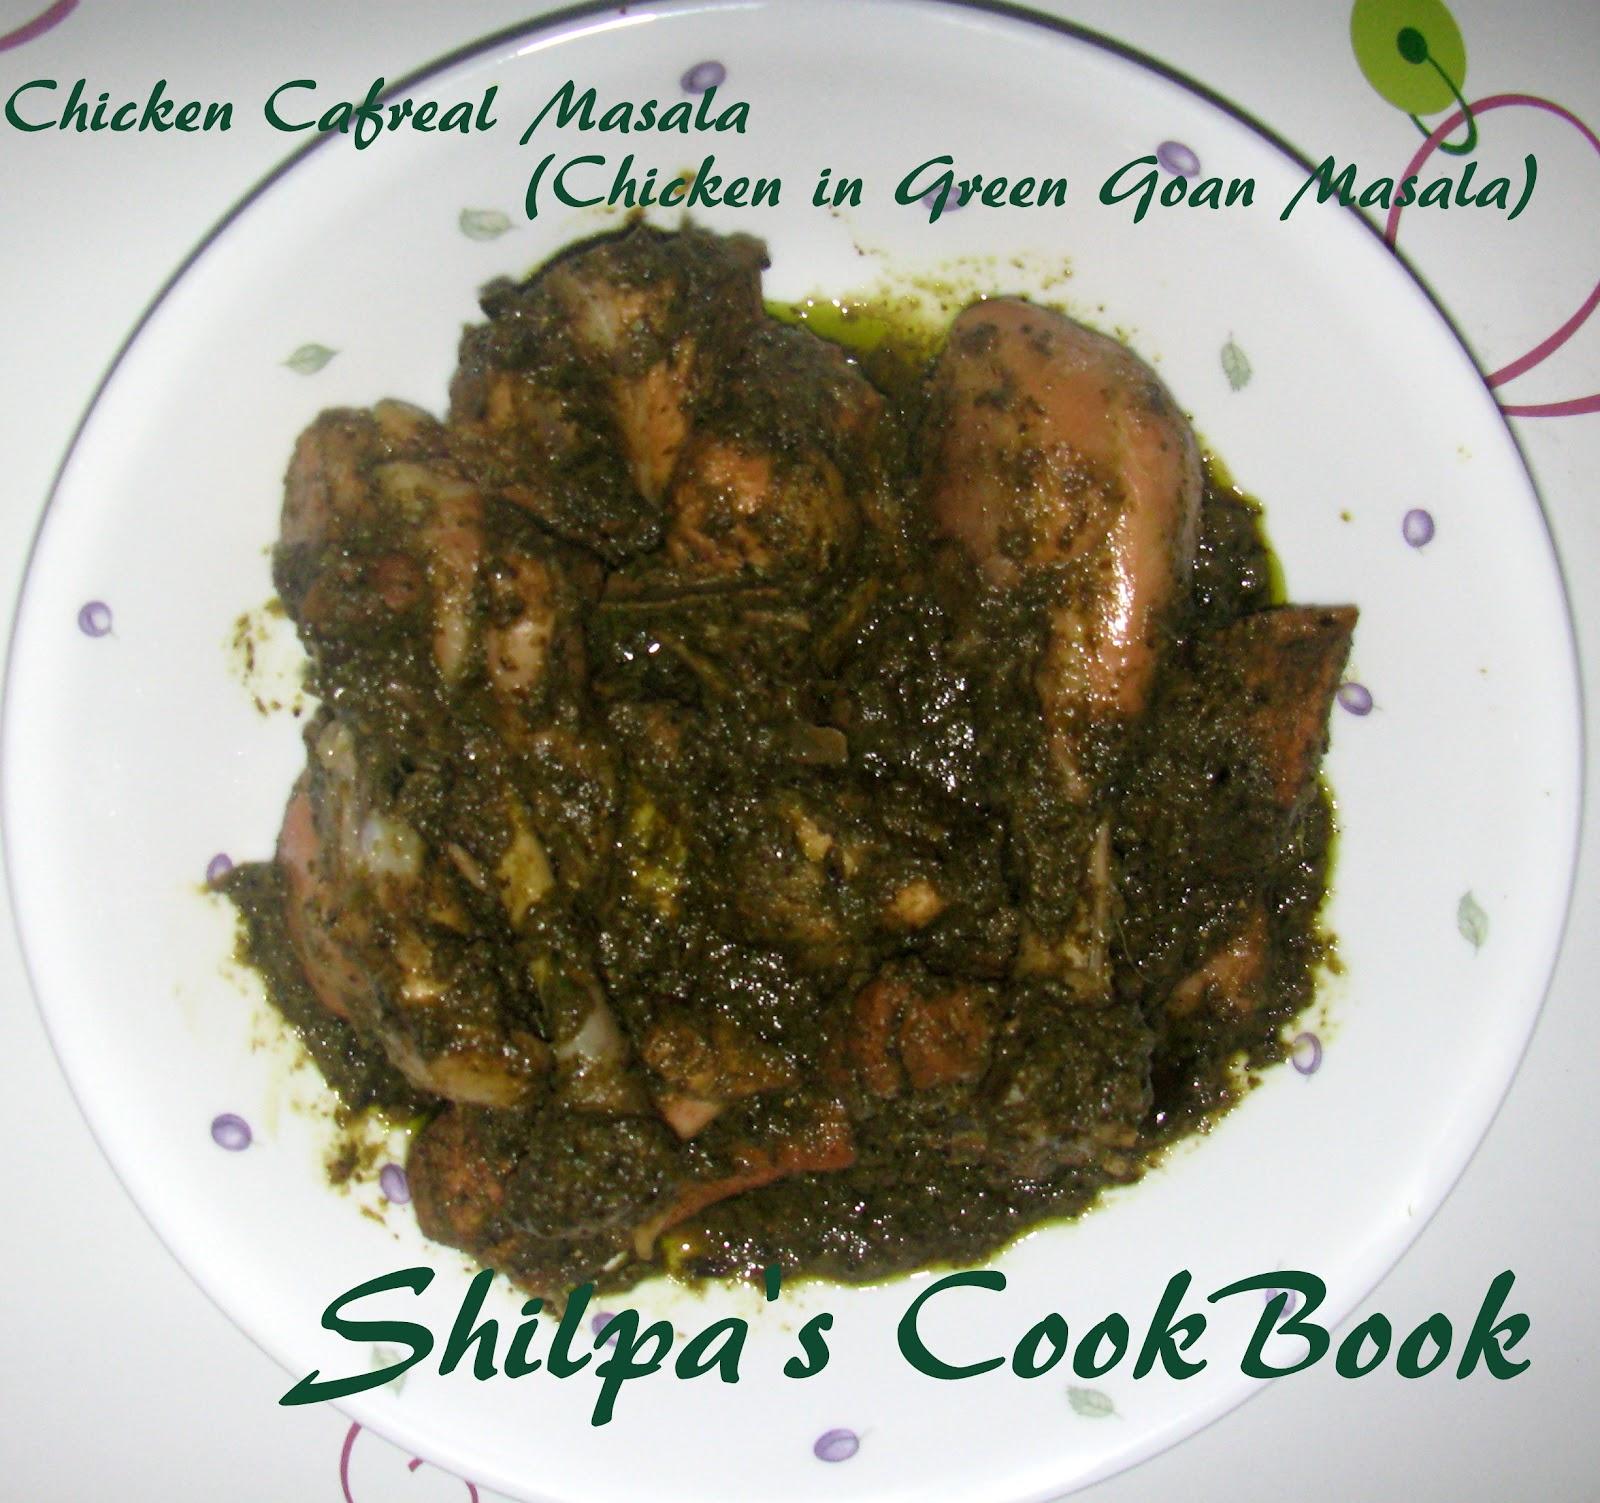 Cook book chicken cafreal fried chicken in green masala goan style chicken cafreal fried chicken in green masala goan style forumfinder Image collections